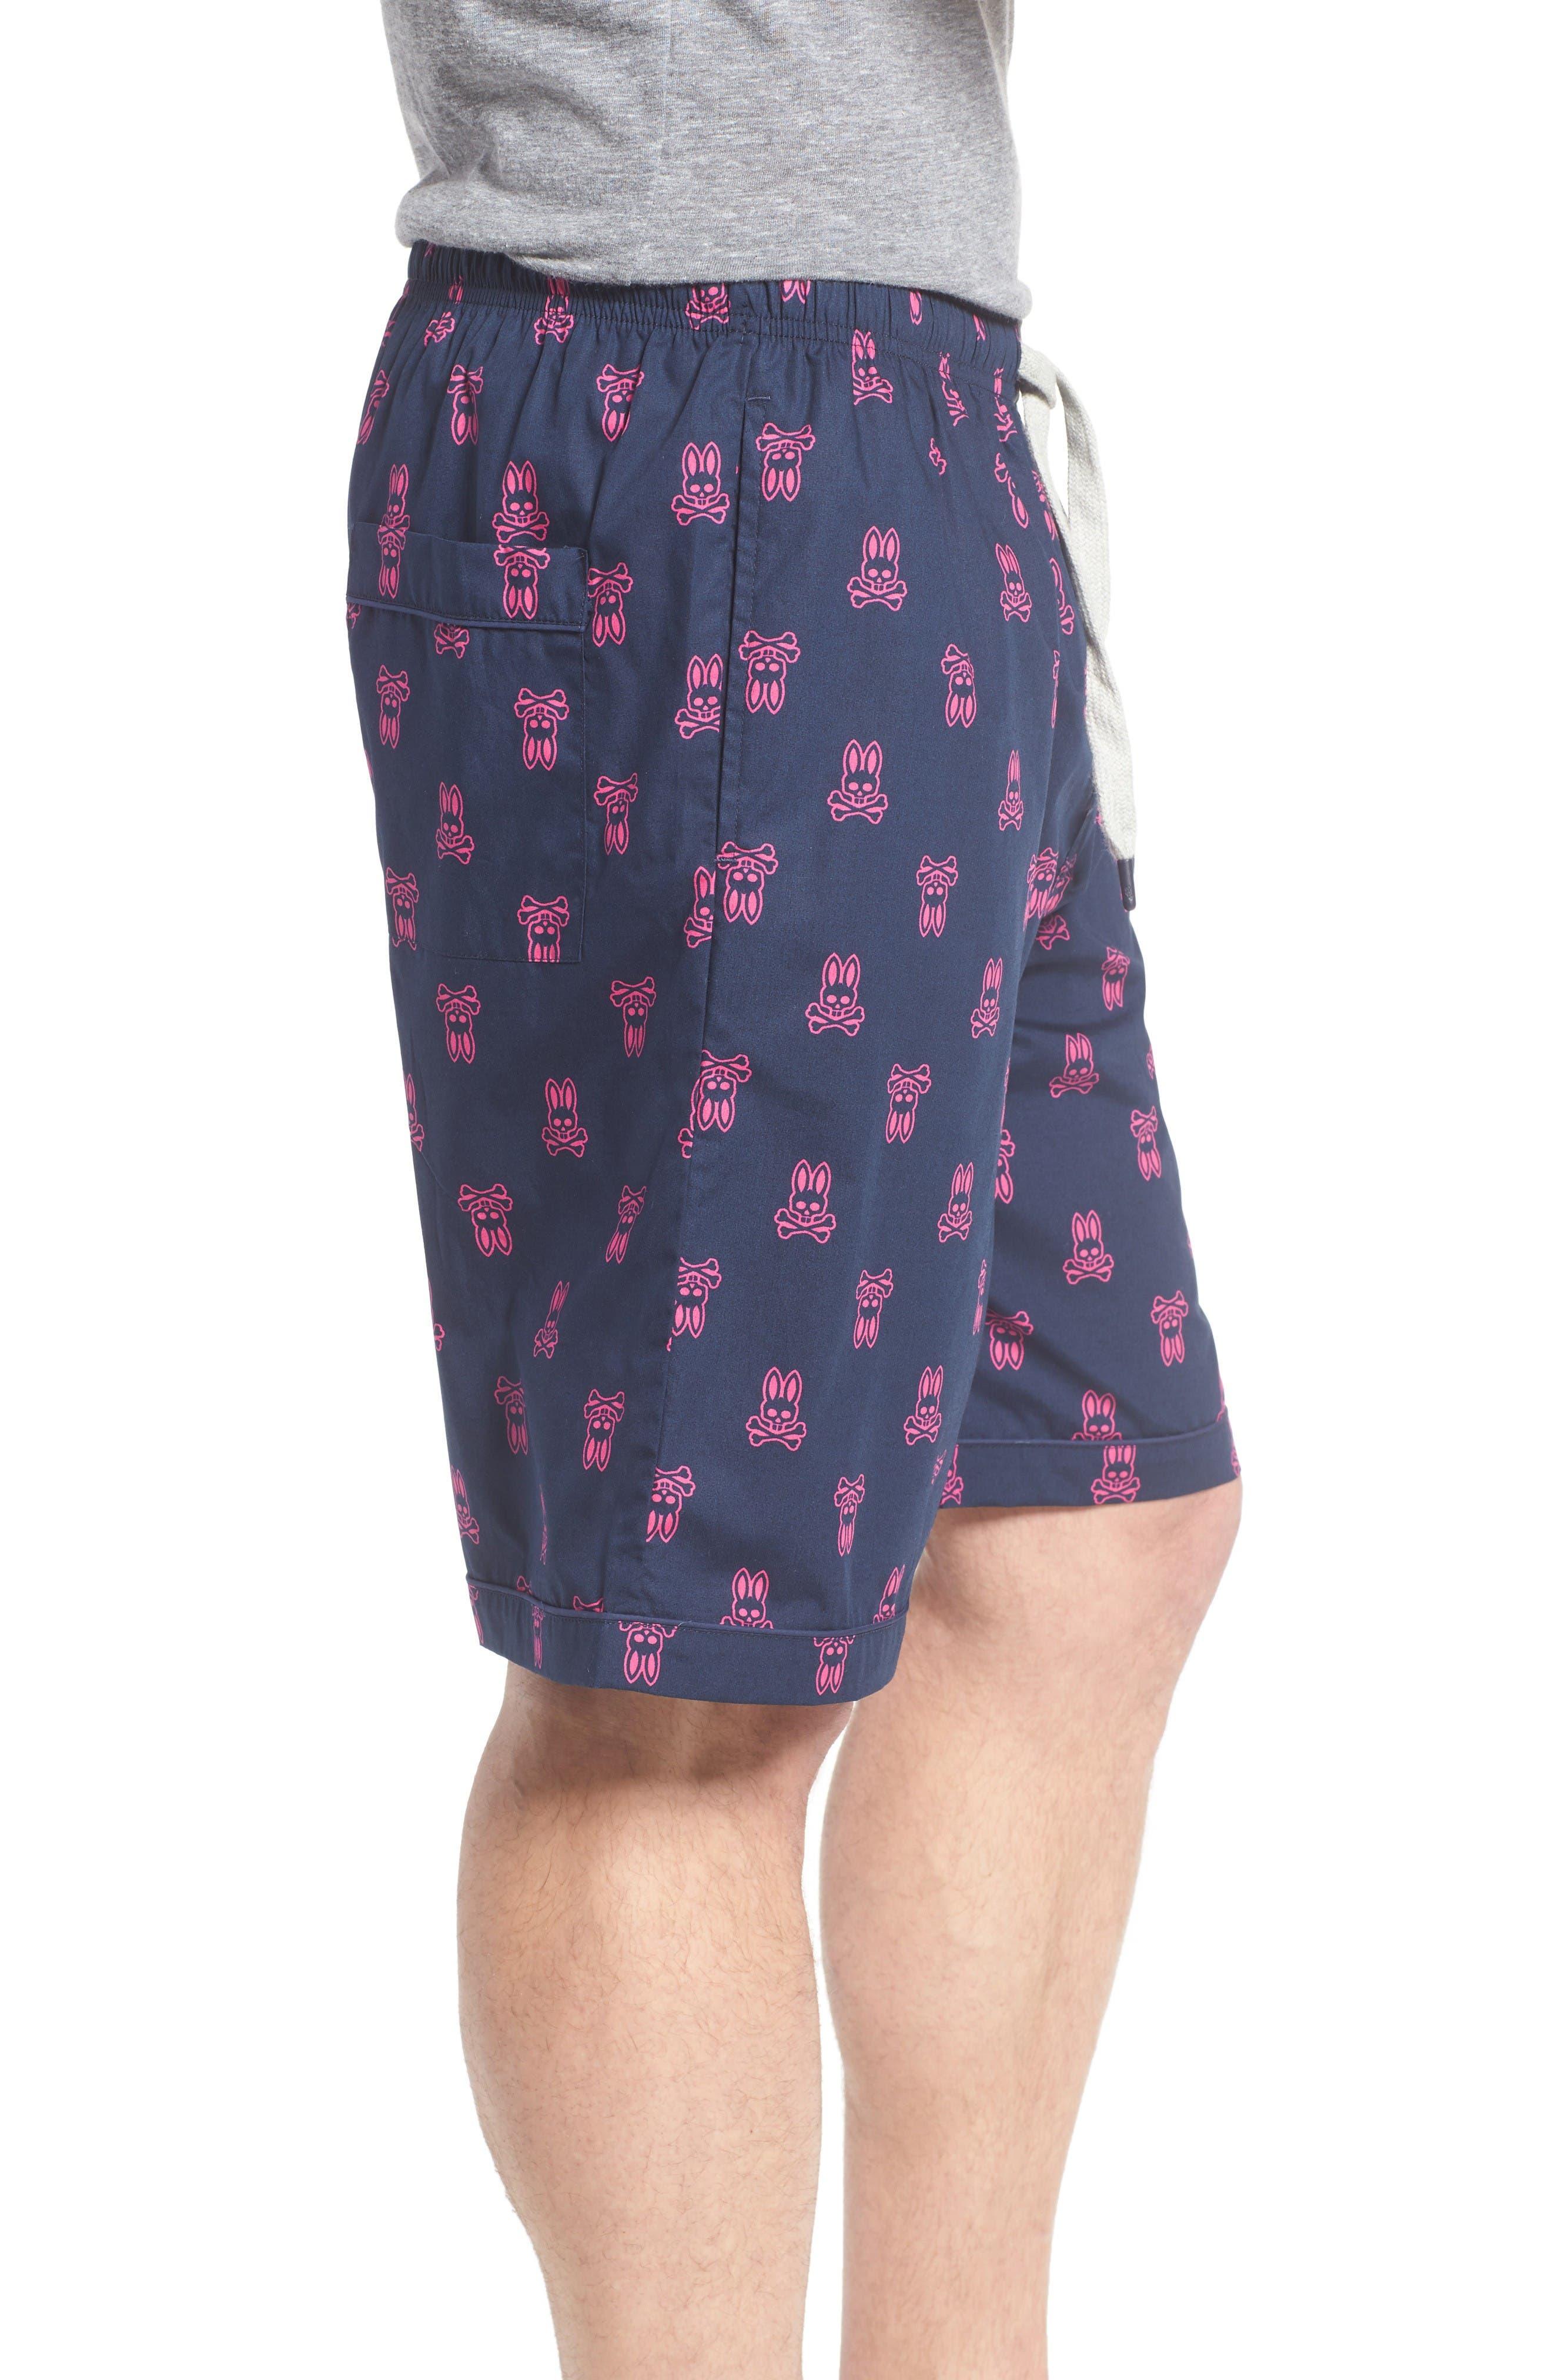 Cotton Lounge Shorts,                             Alternate thumbnail 3, color,                             Peacoat Bunny